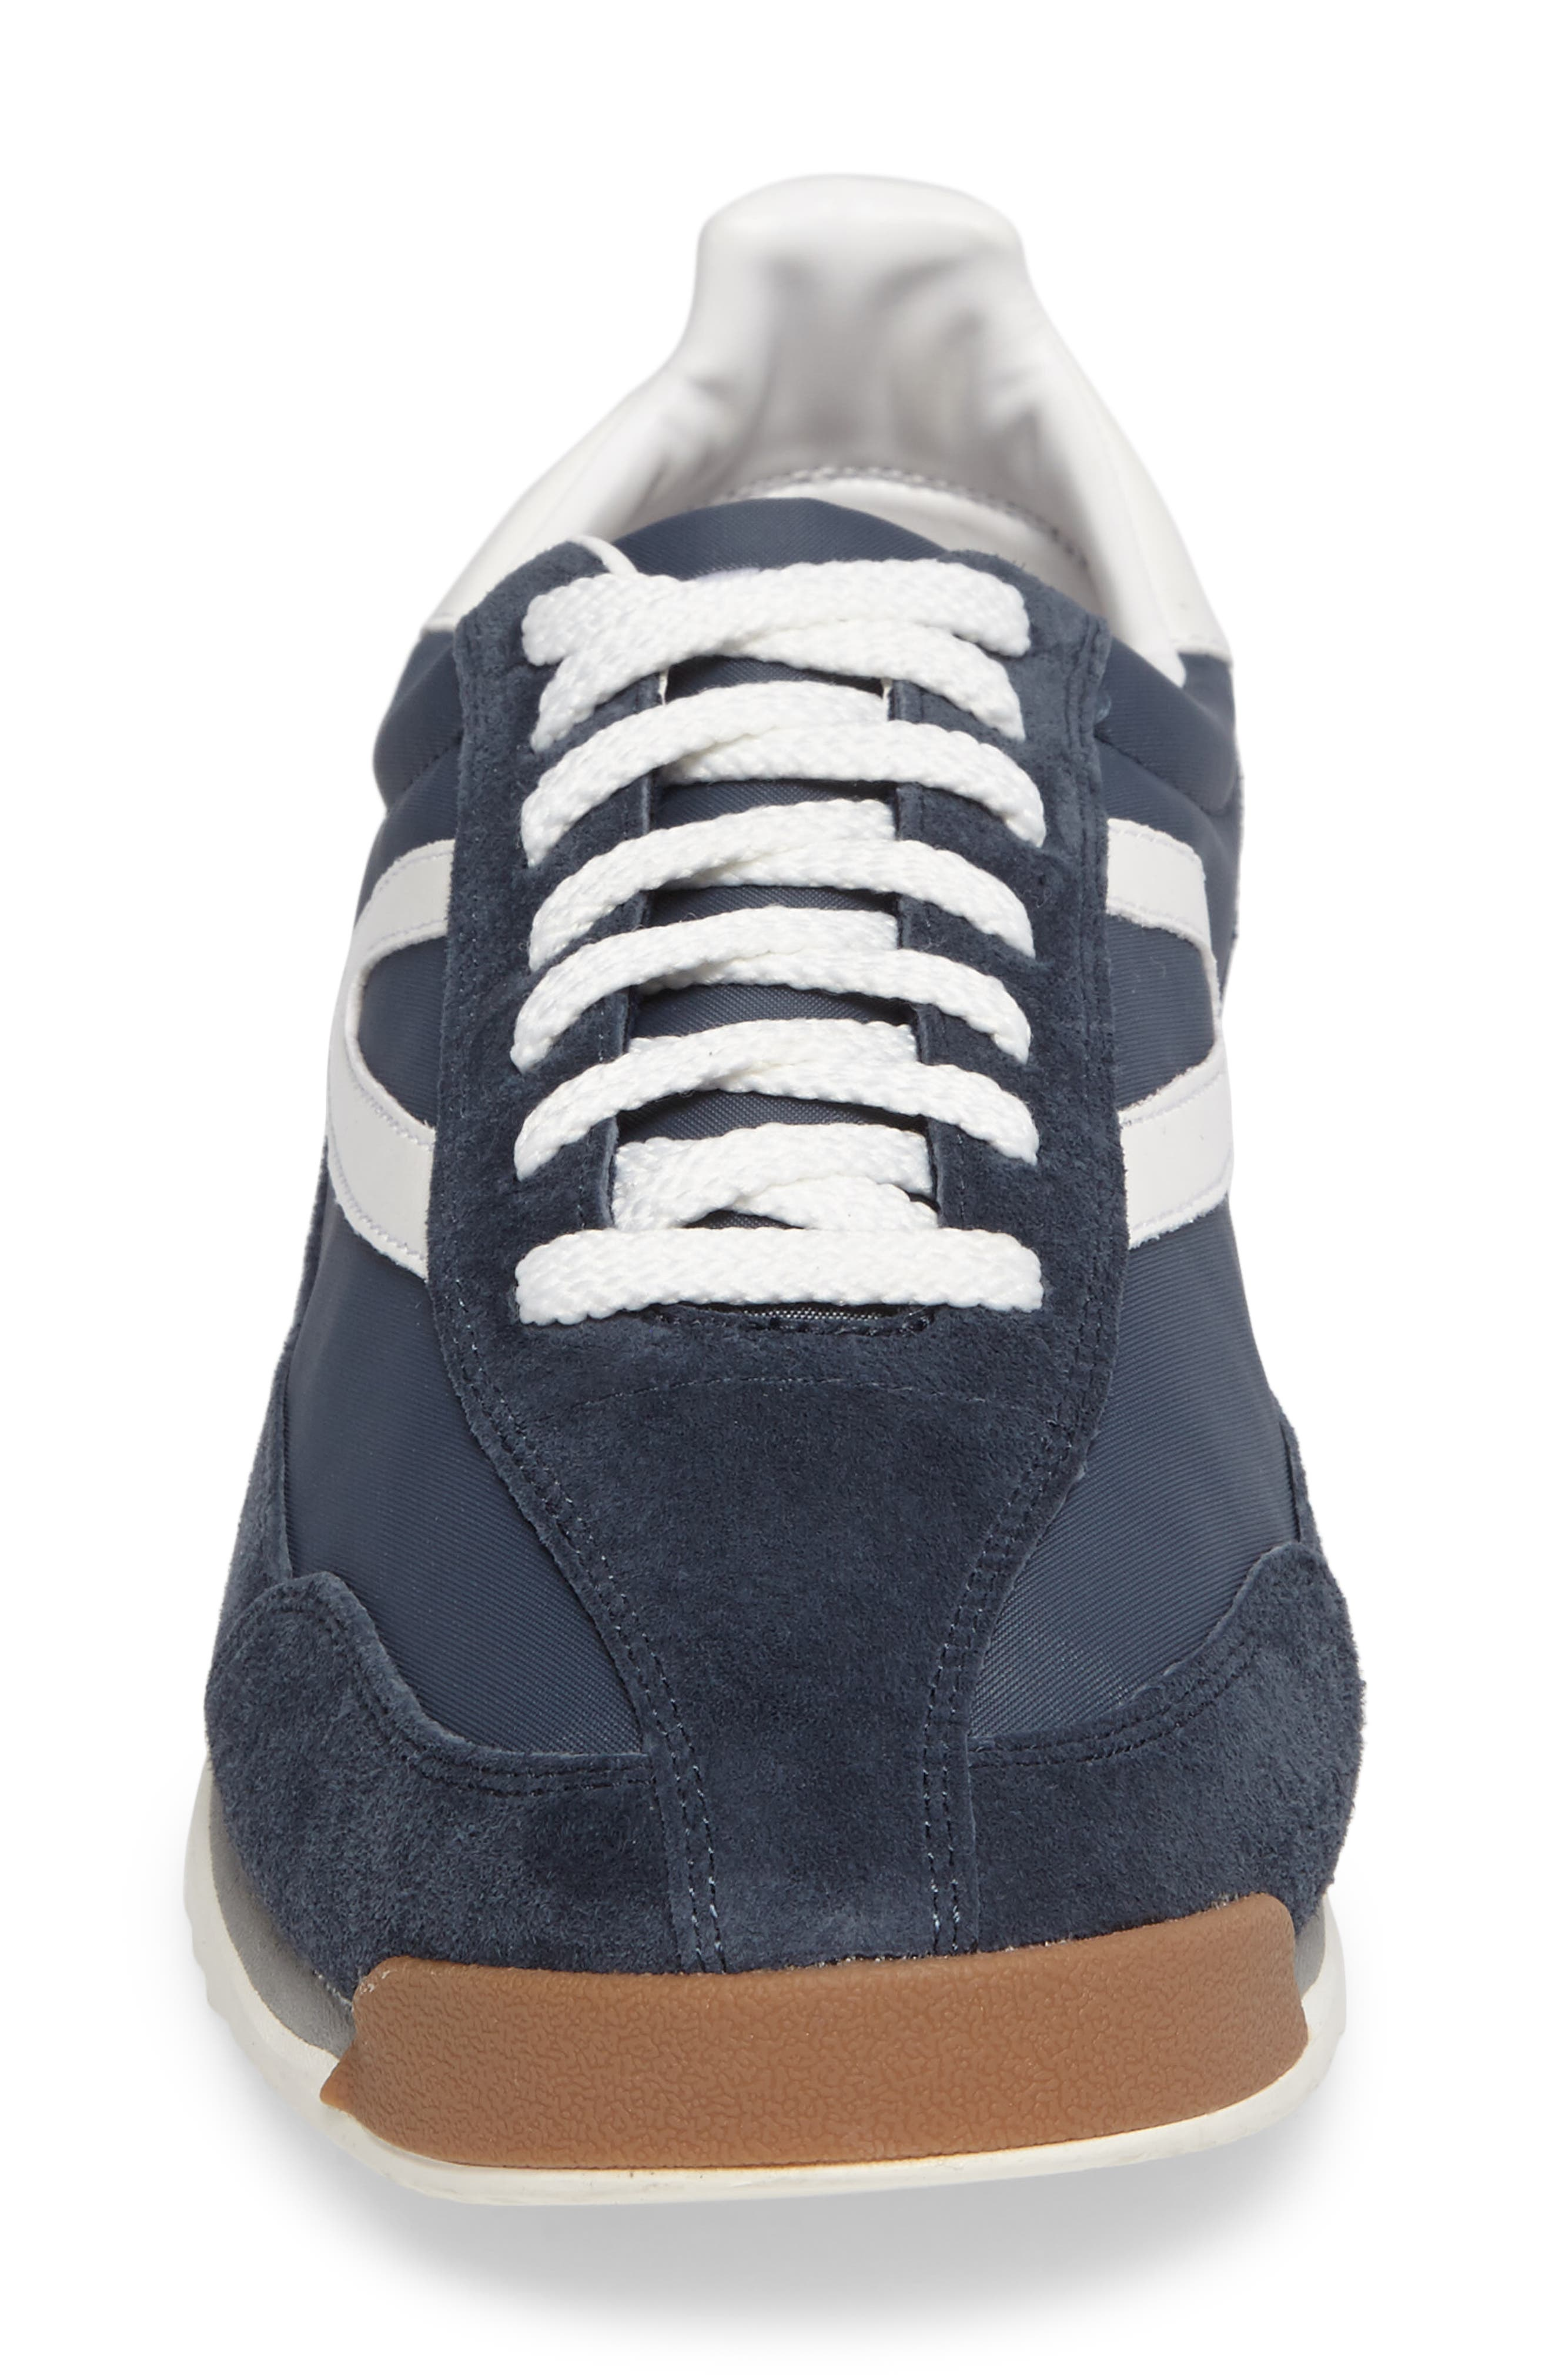 Rawlins 3 Sneaker,                             Alternate thumbnail 4, color,                             Blue/ Blue/ White